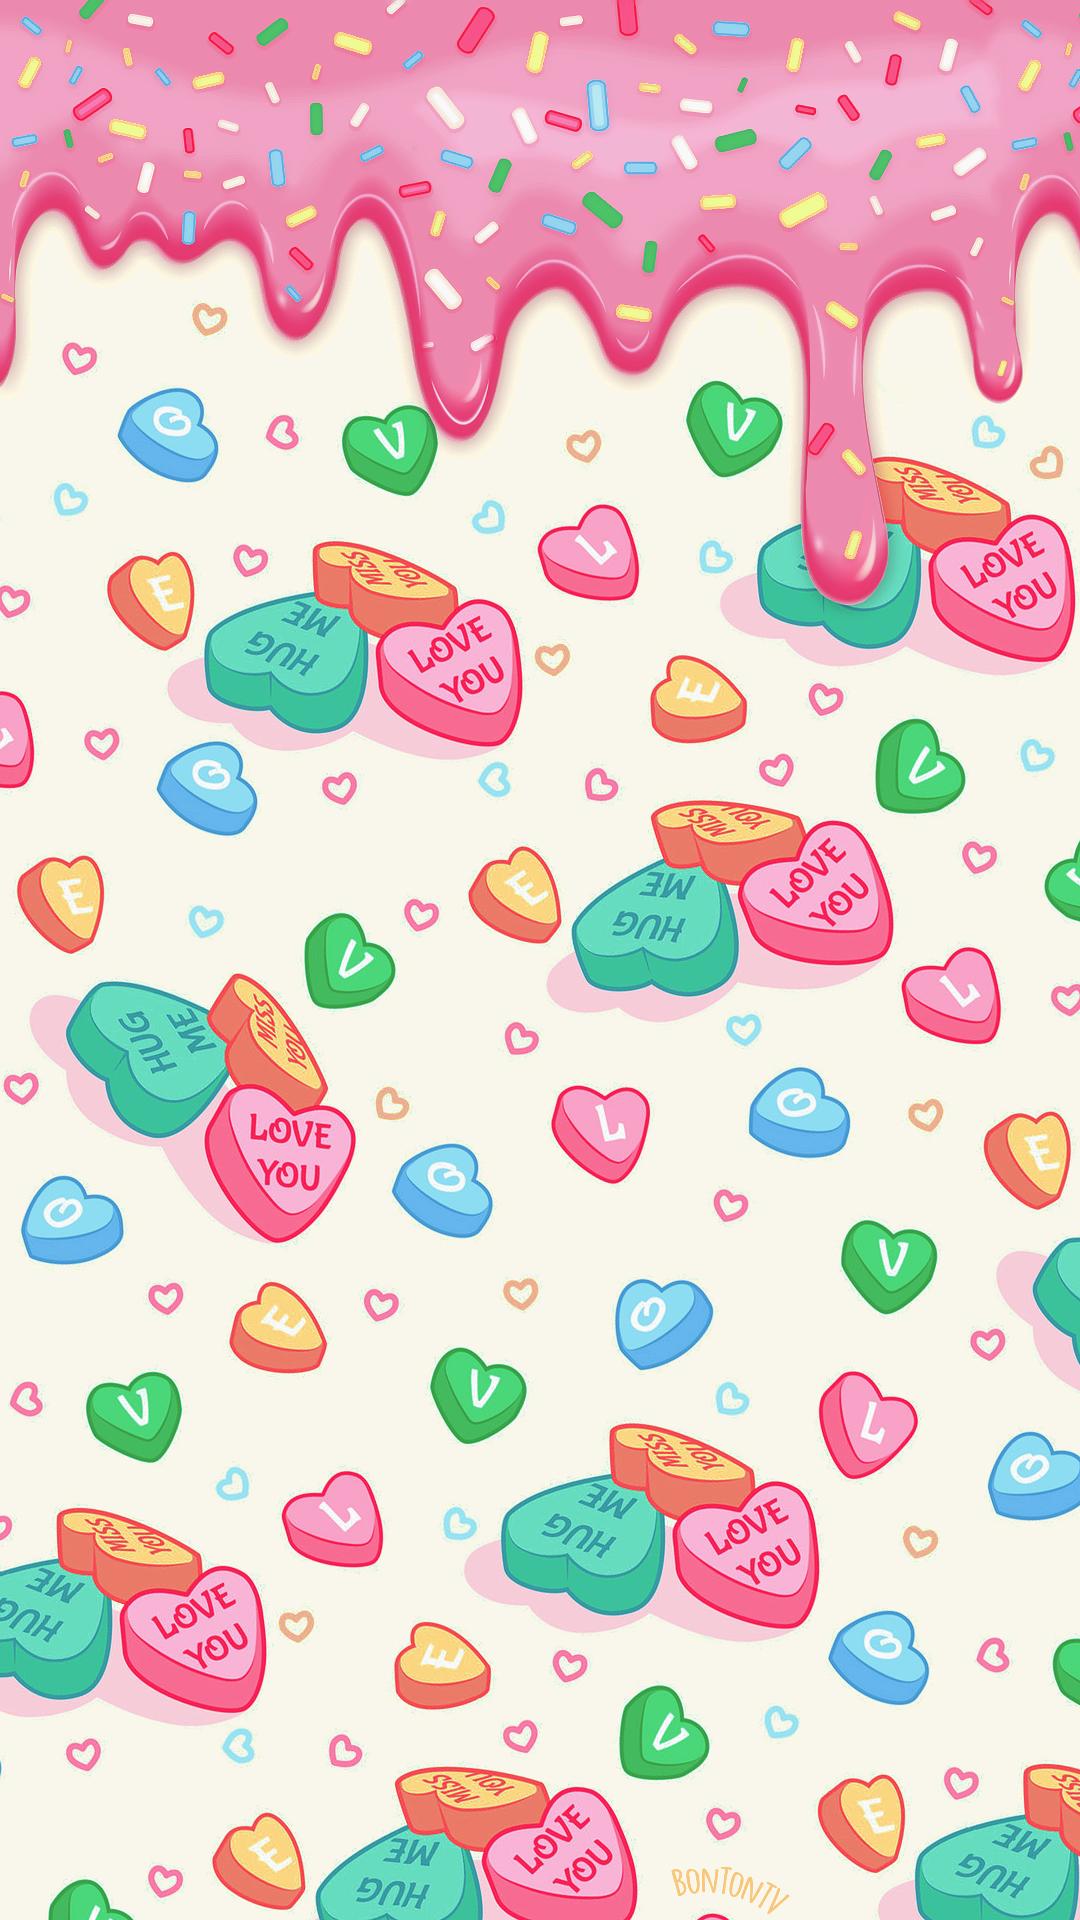 Cute Food Images Wallpaper Nekeran Com Candy Background Cute Food Wallpaper Candy